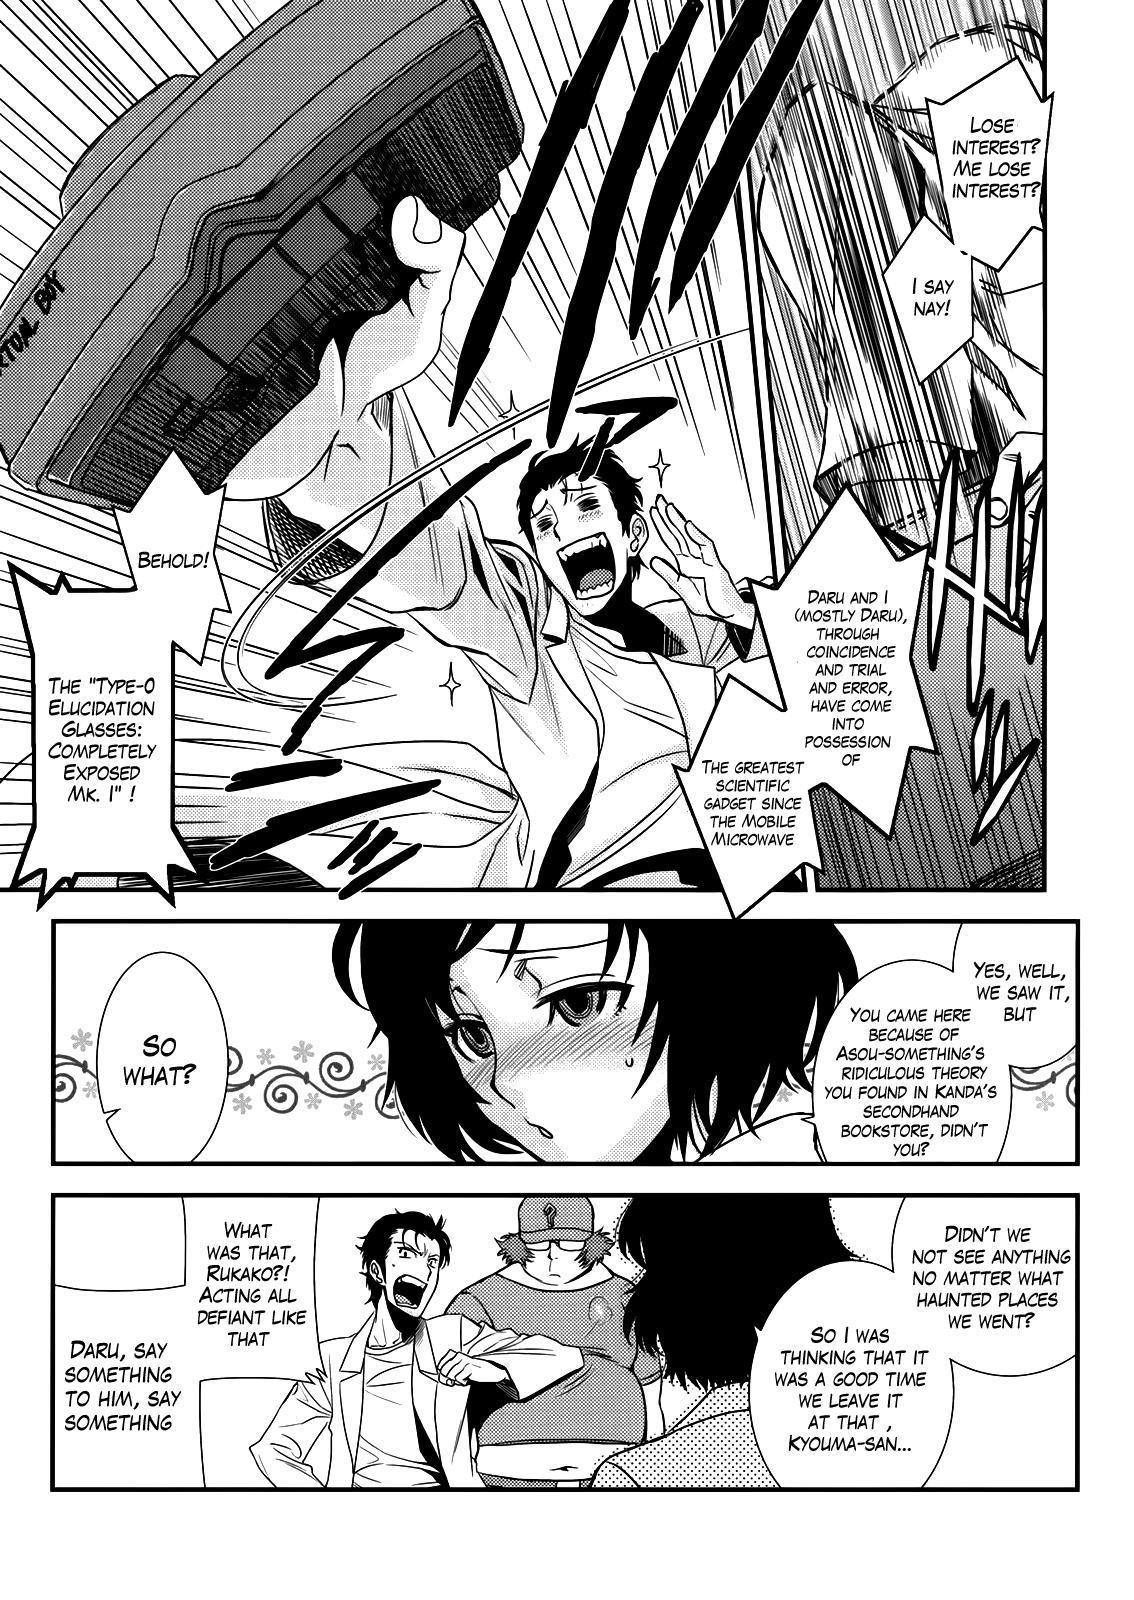 Hontou ni Atta Kowai Hanashi   It Really Was There! A Scary Story 5